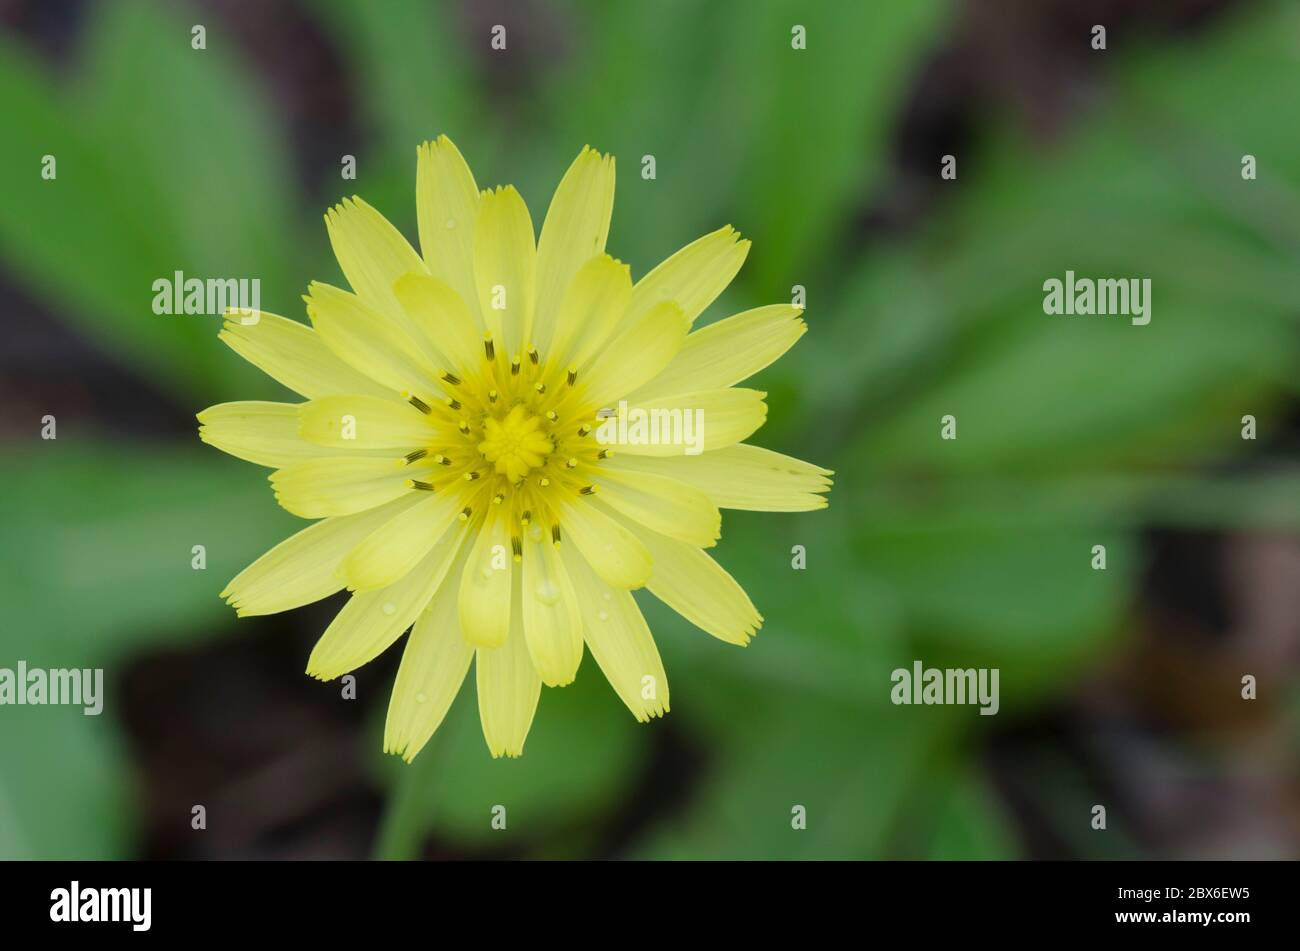 False Dandelion, Pyrrhopappus sp. Stock Photo